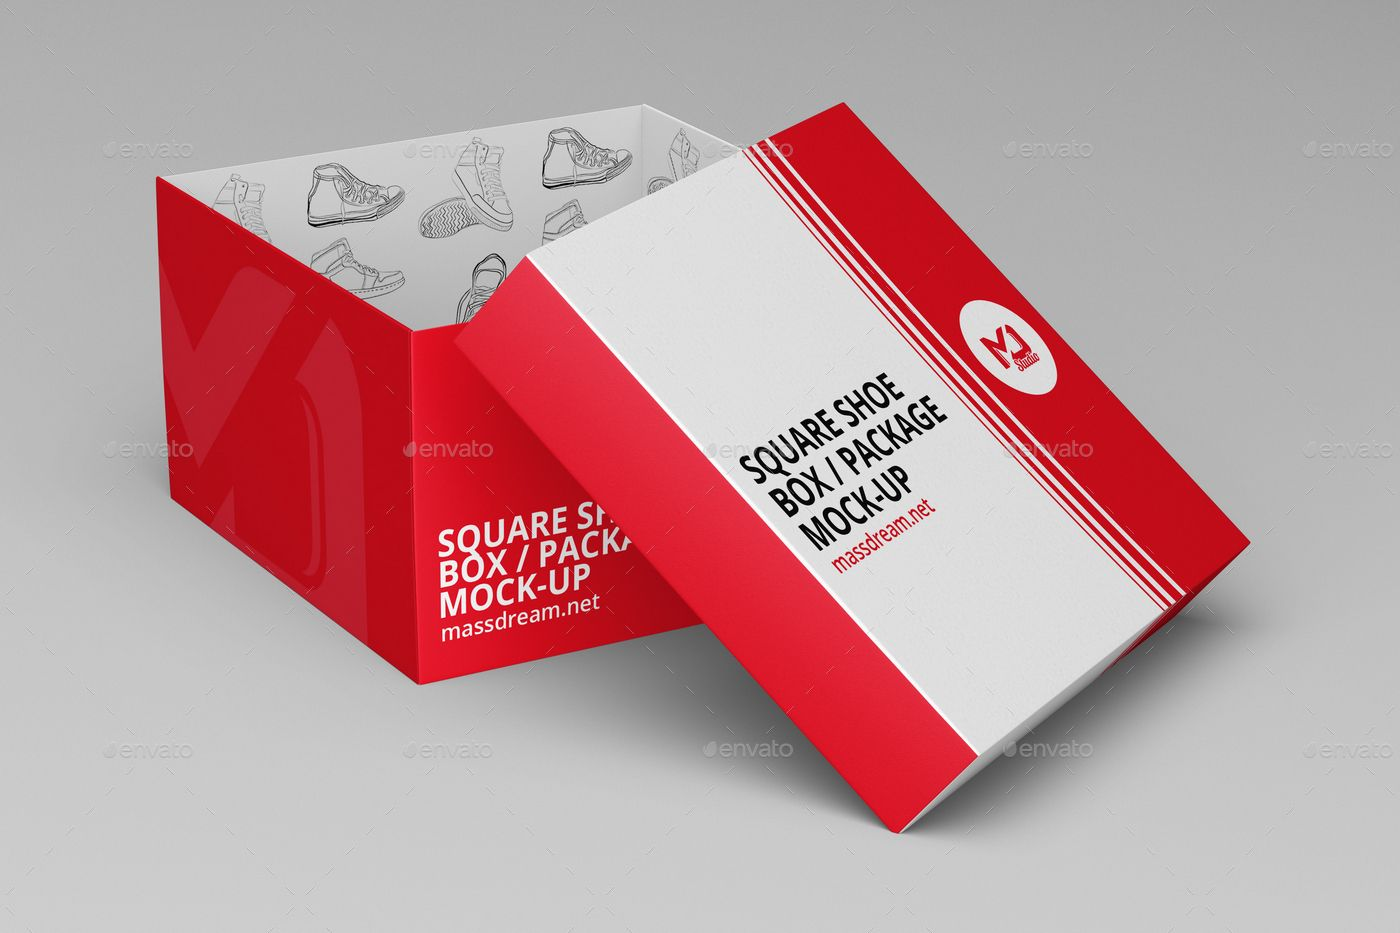 Download Square Shoe Box Package Mock Up Box Mockup Box Design Templates Packaging Mockup